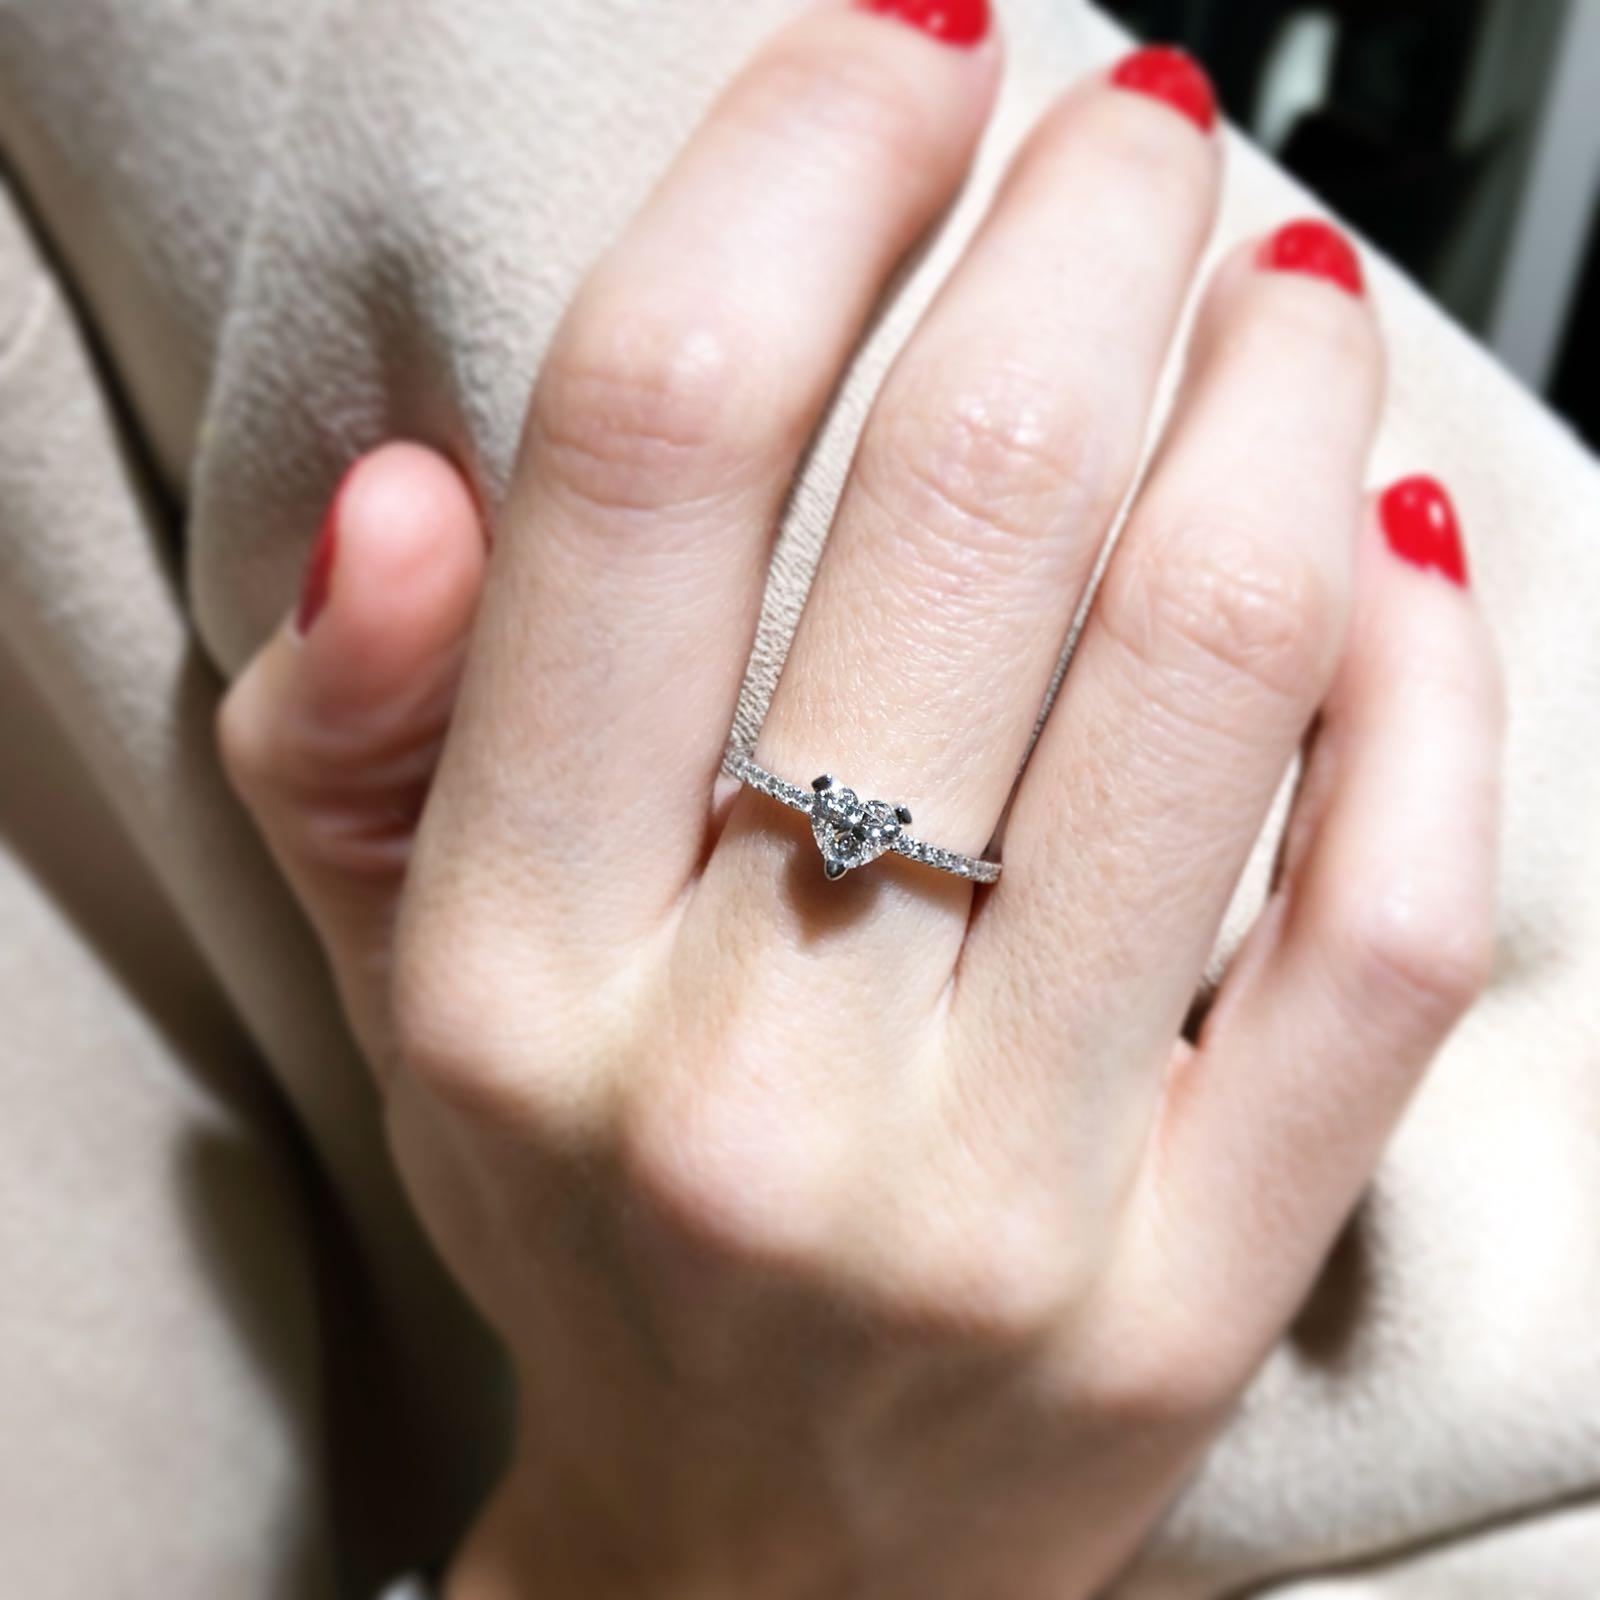 solitario de compromiso diamante corazón